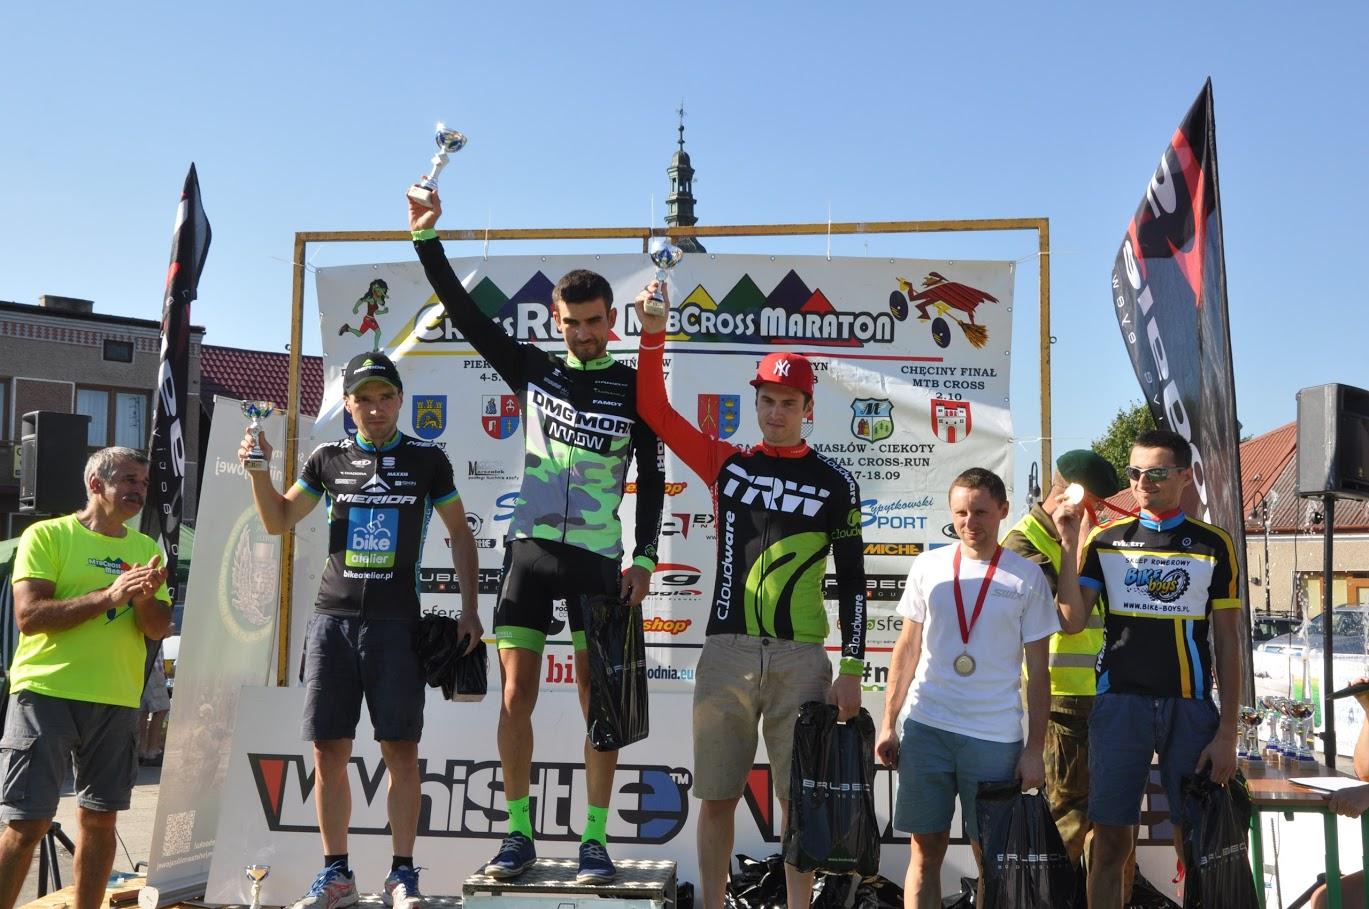 Kamil Pomarański (DMG Mori Cyclo Trener Team) – ŚLR MTB Cross Marathon, Bodzentyn